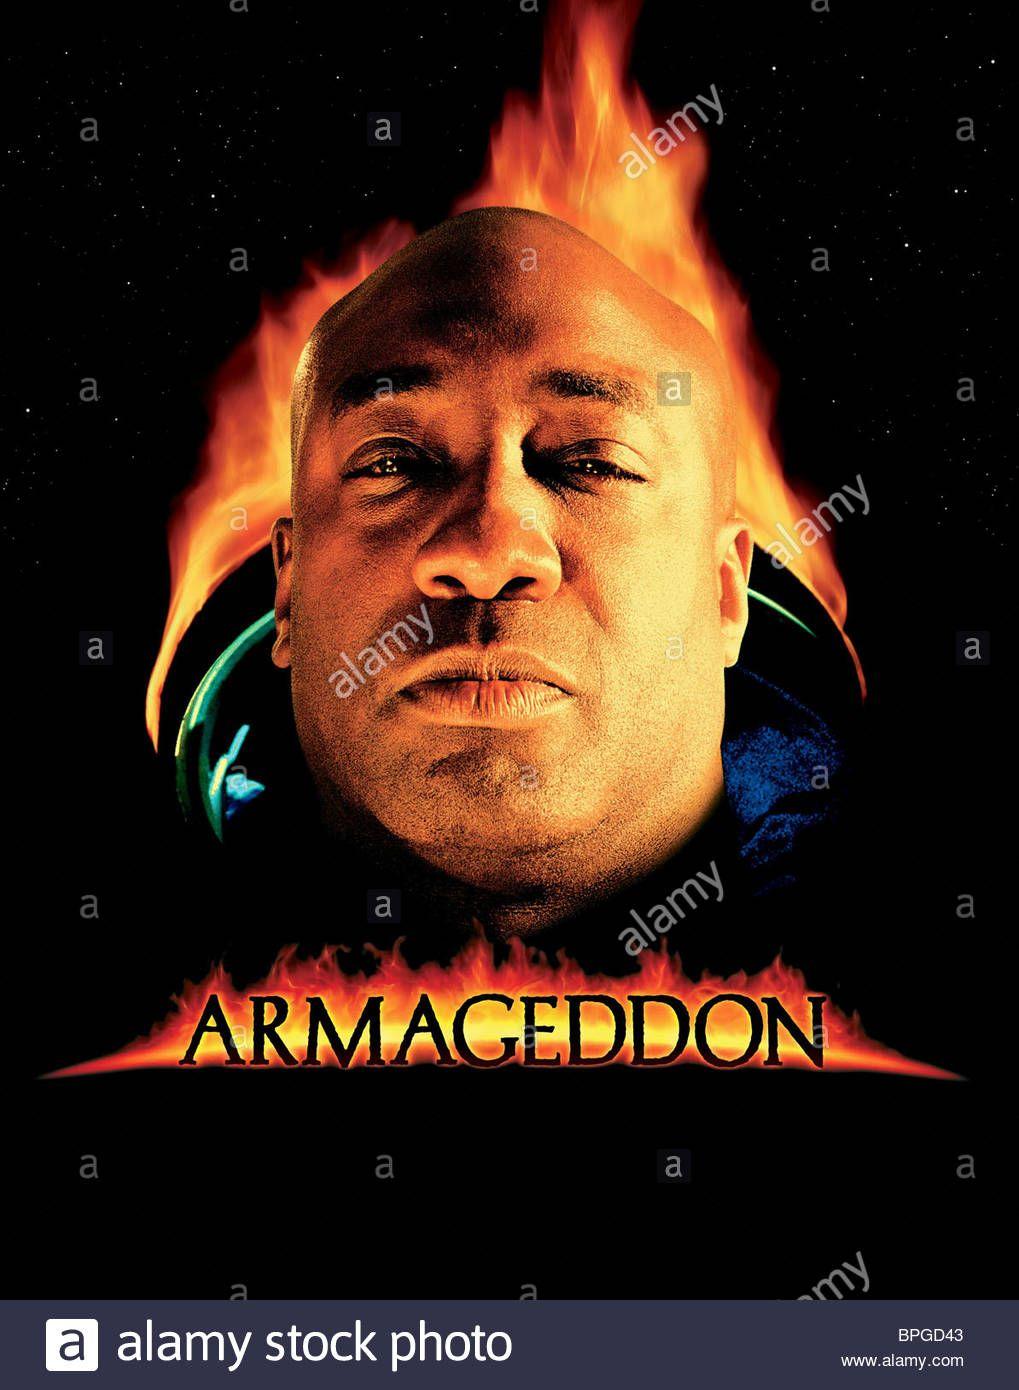 Armageddon 1998 Armageddon Bernie Mac Movie Posters